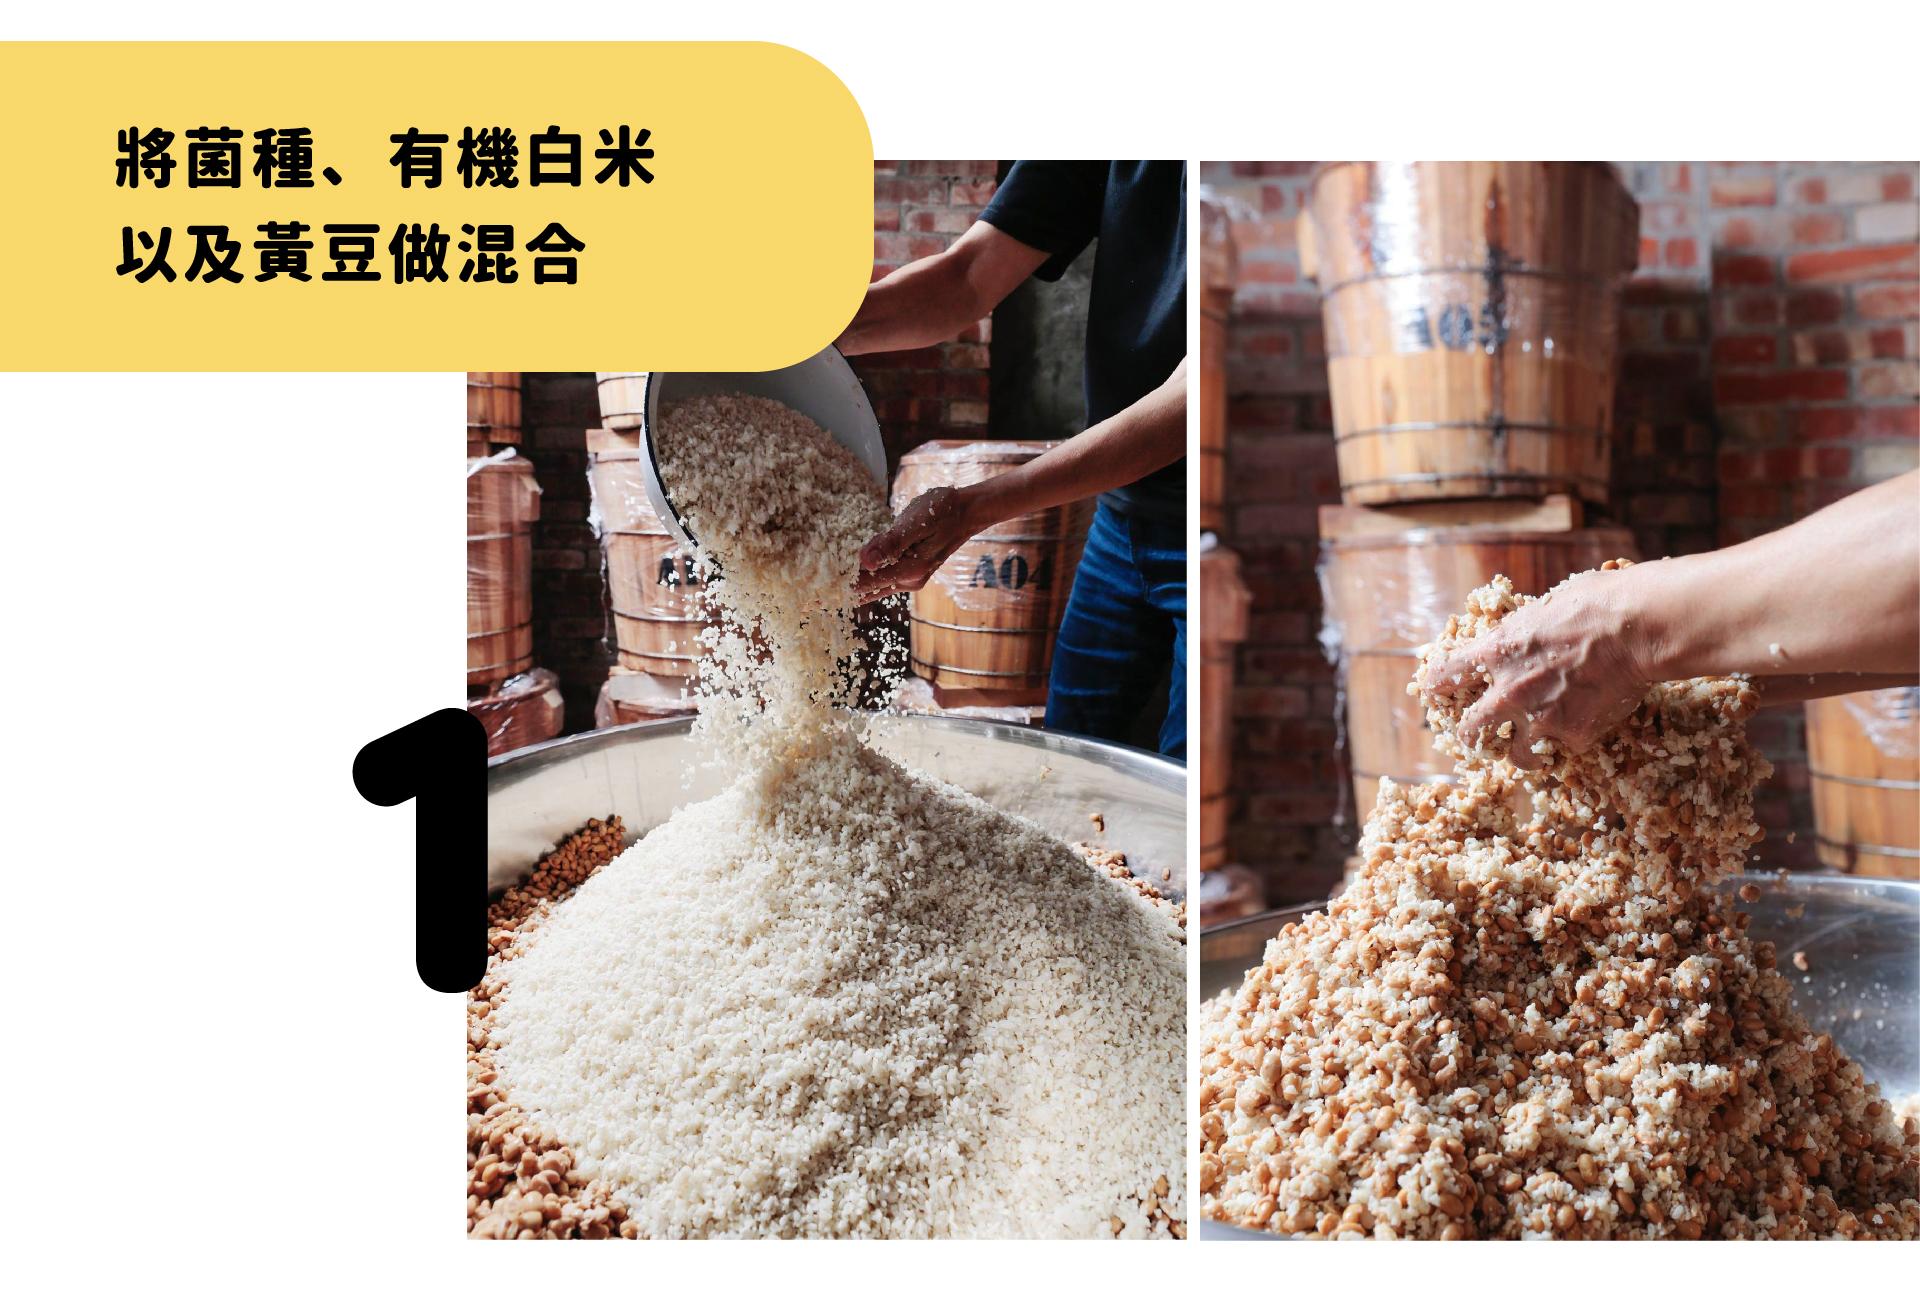 Miso Tamari suitable for light seasoning and various dipping, drizzling and blending. | Taiwan domestic non-GMO soy milk shop | HIDEKAWA